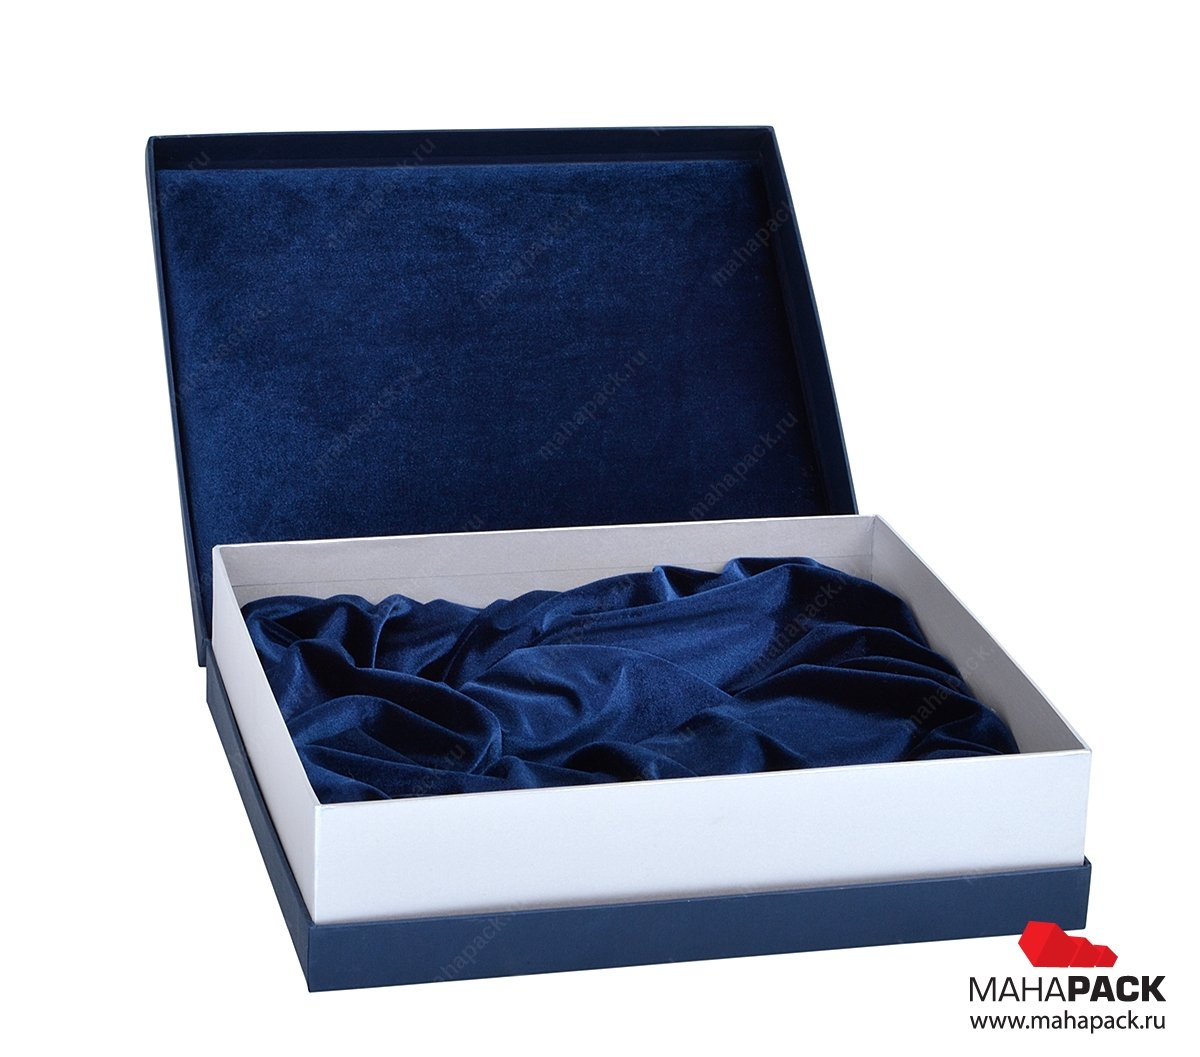 упаковка подарочная коробка для корпоративных подарков